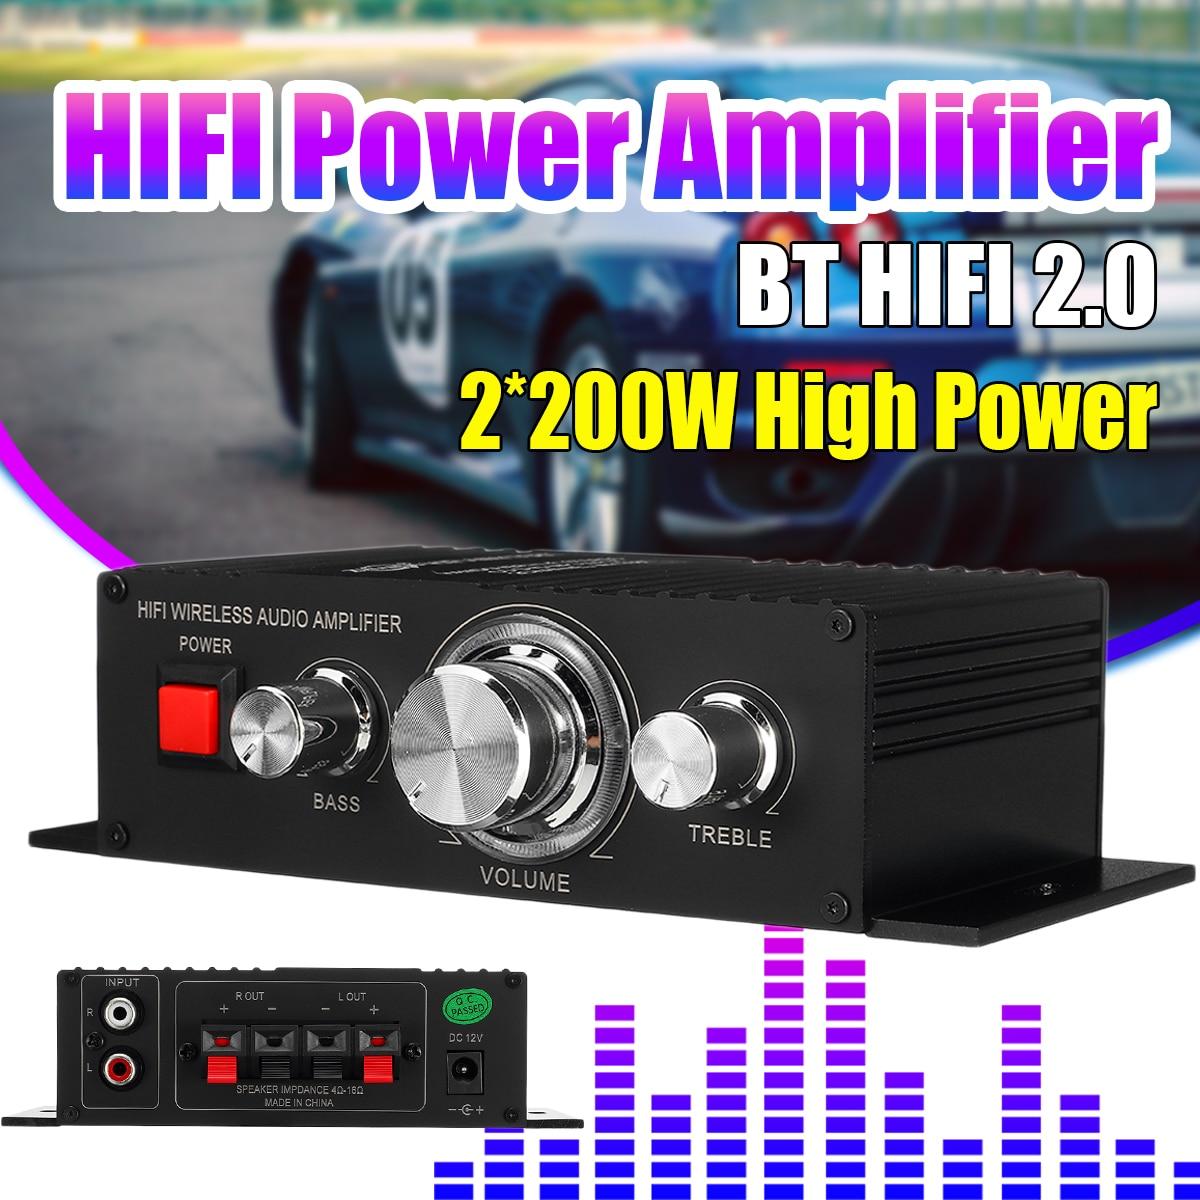 12V 2*200W Stereo Hifi Car Home Subwoofer Amplifier Amp Sound Speaker bluetooth 4.2+EDR Audio LED Design